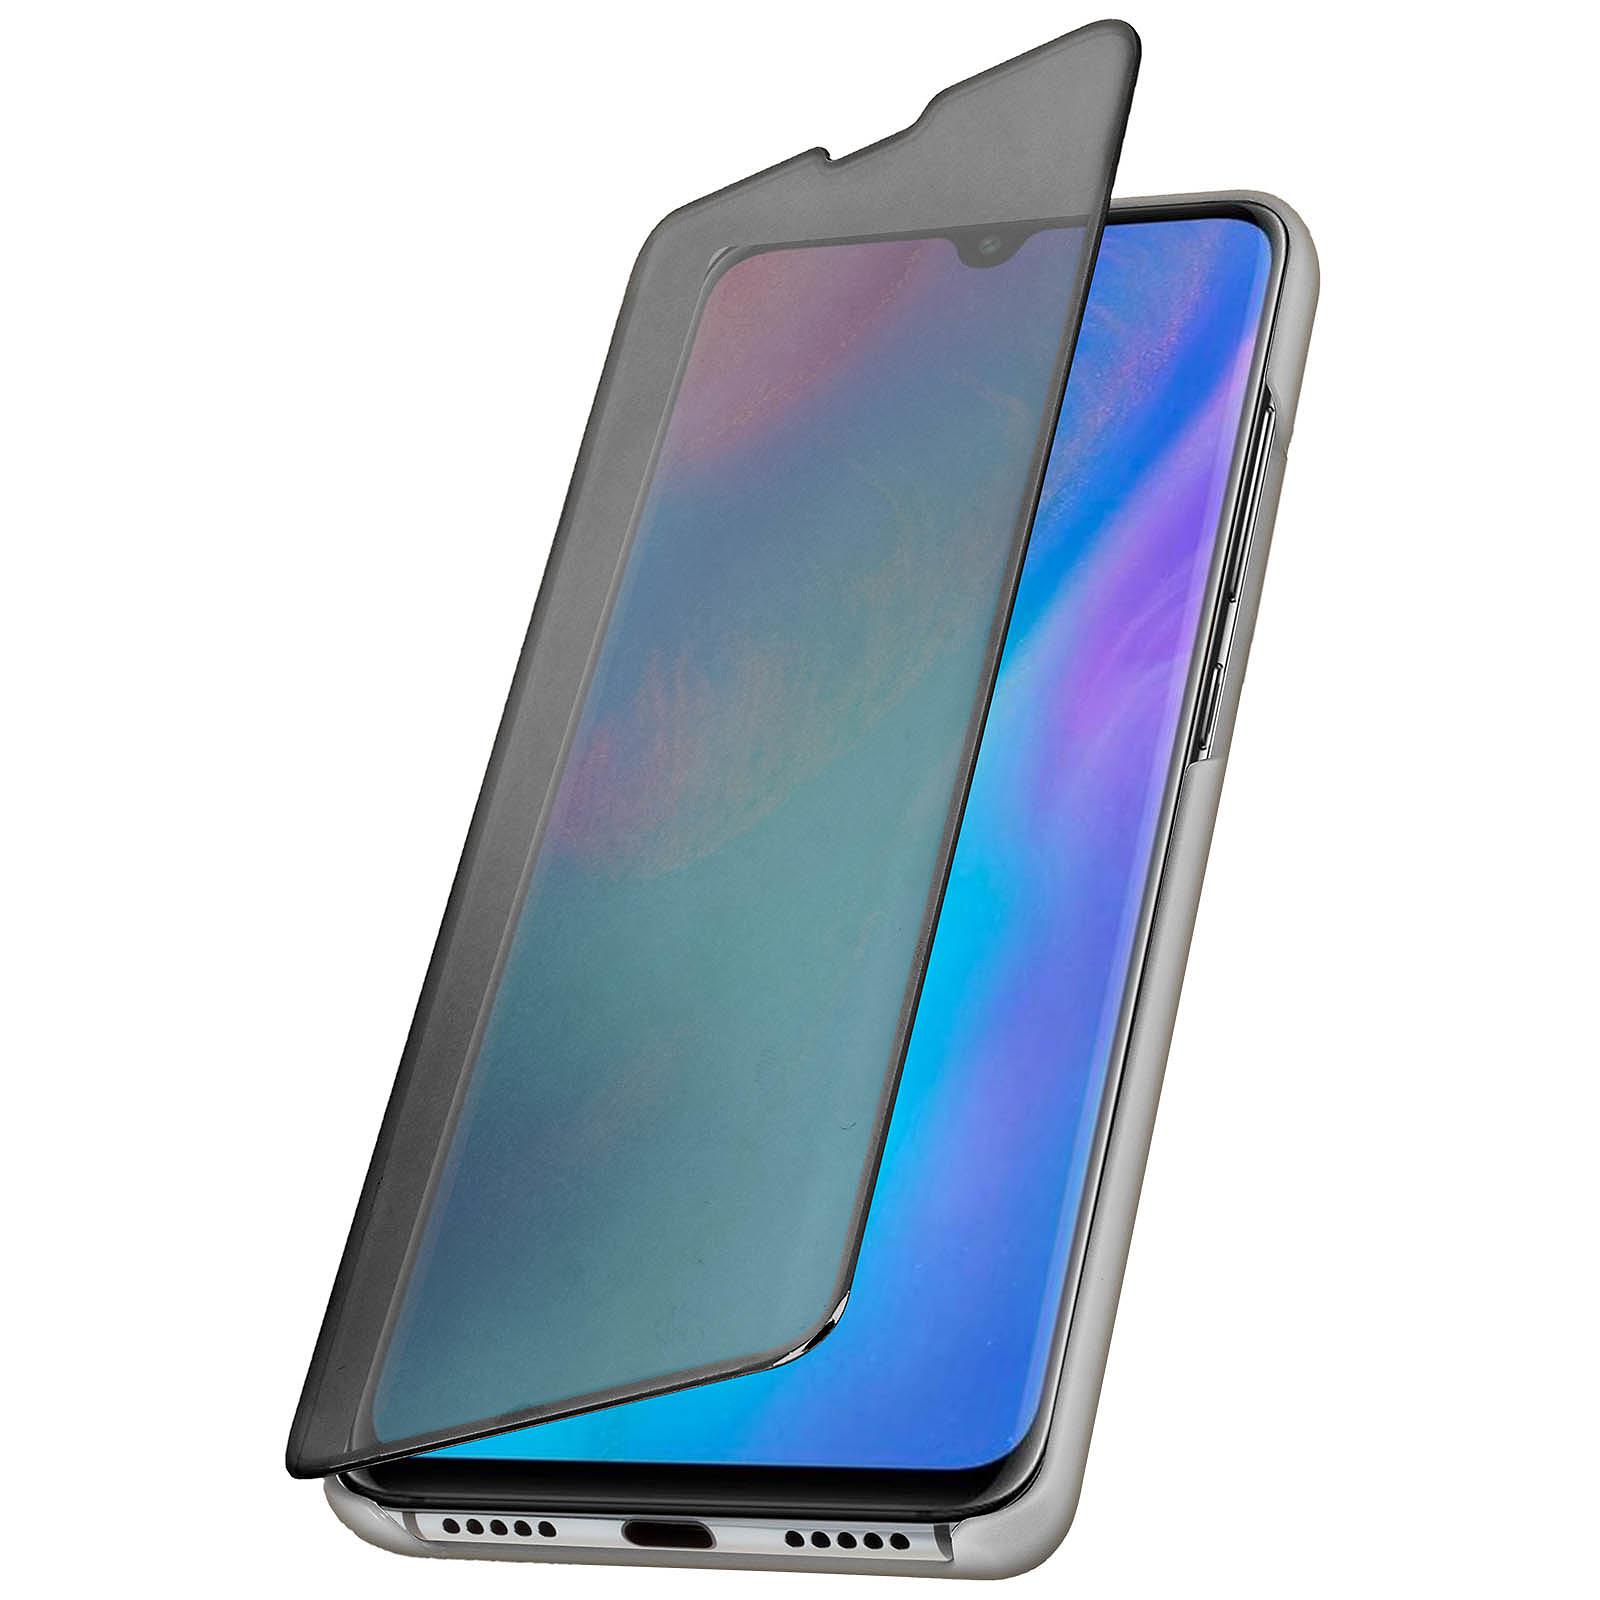 Avizar Etui folio Argent pour Huawei P30 Pro